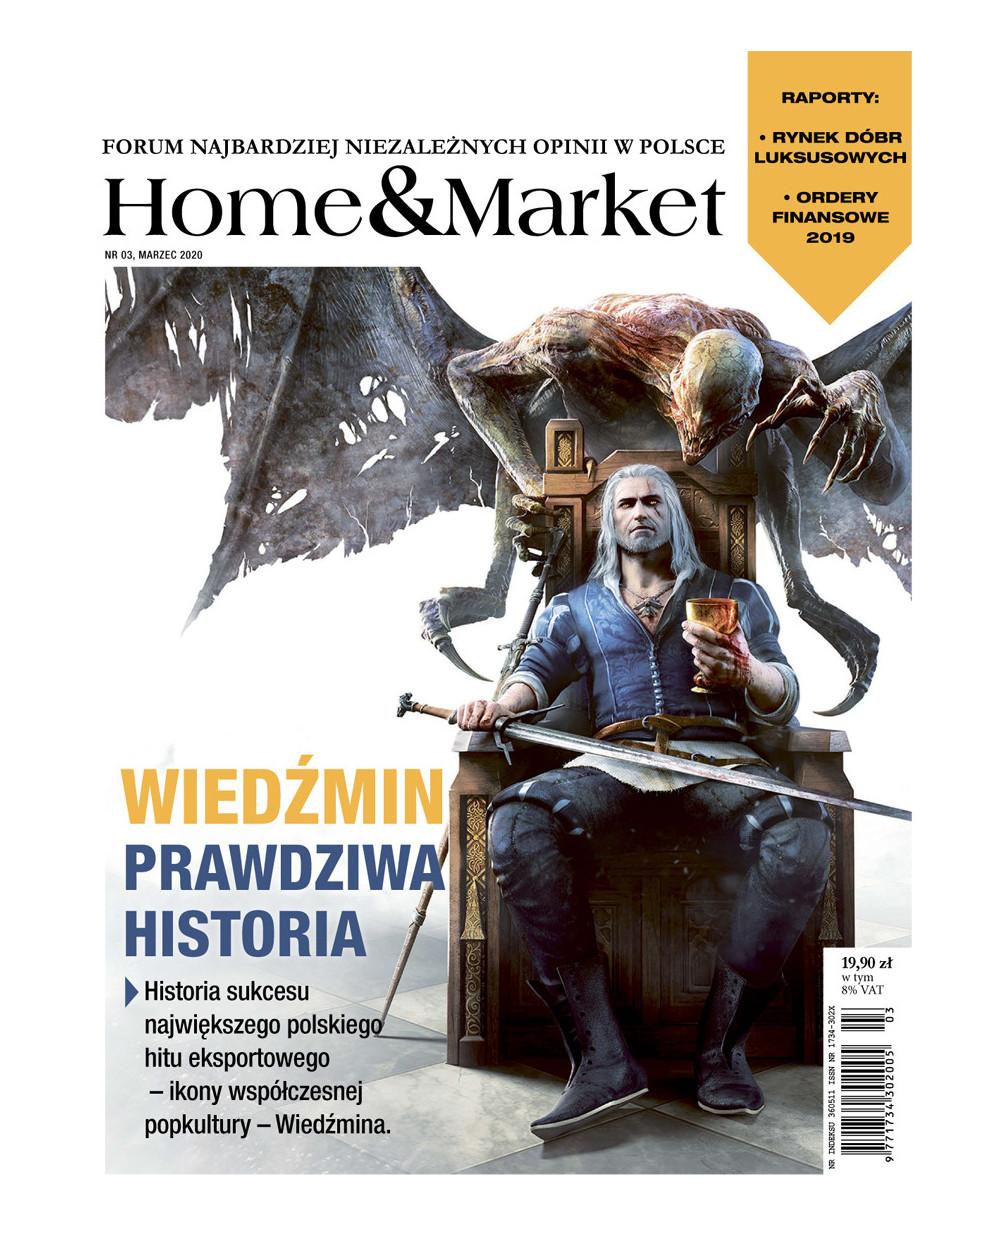 Home&Market 03/2020